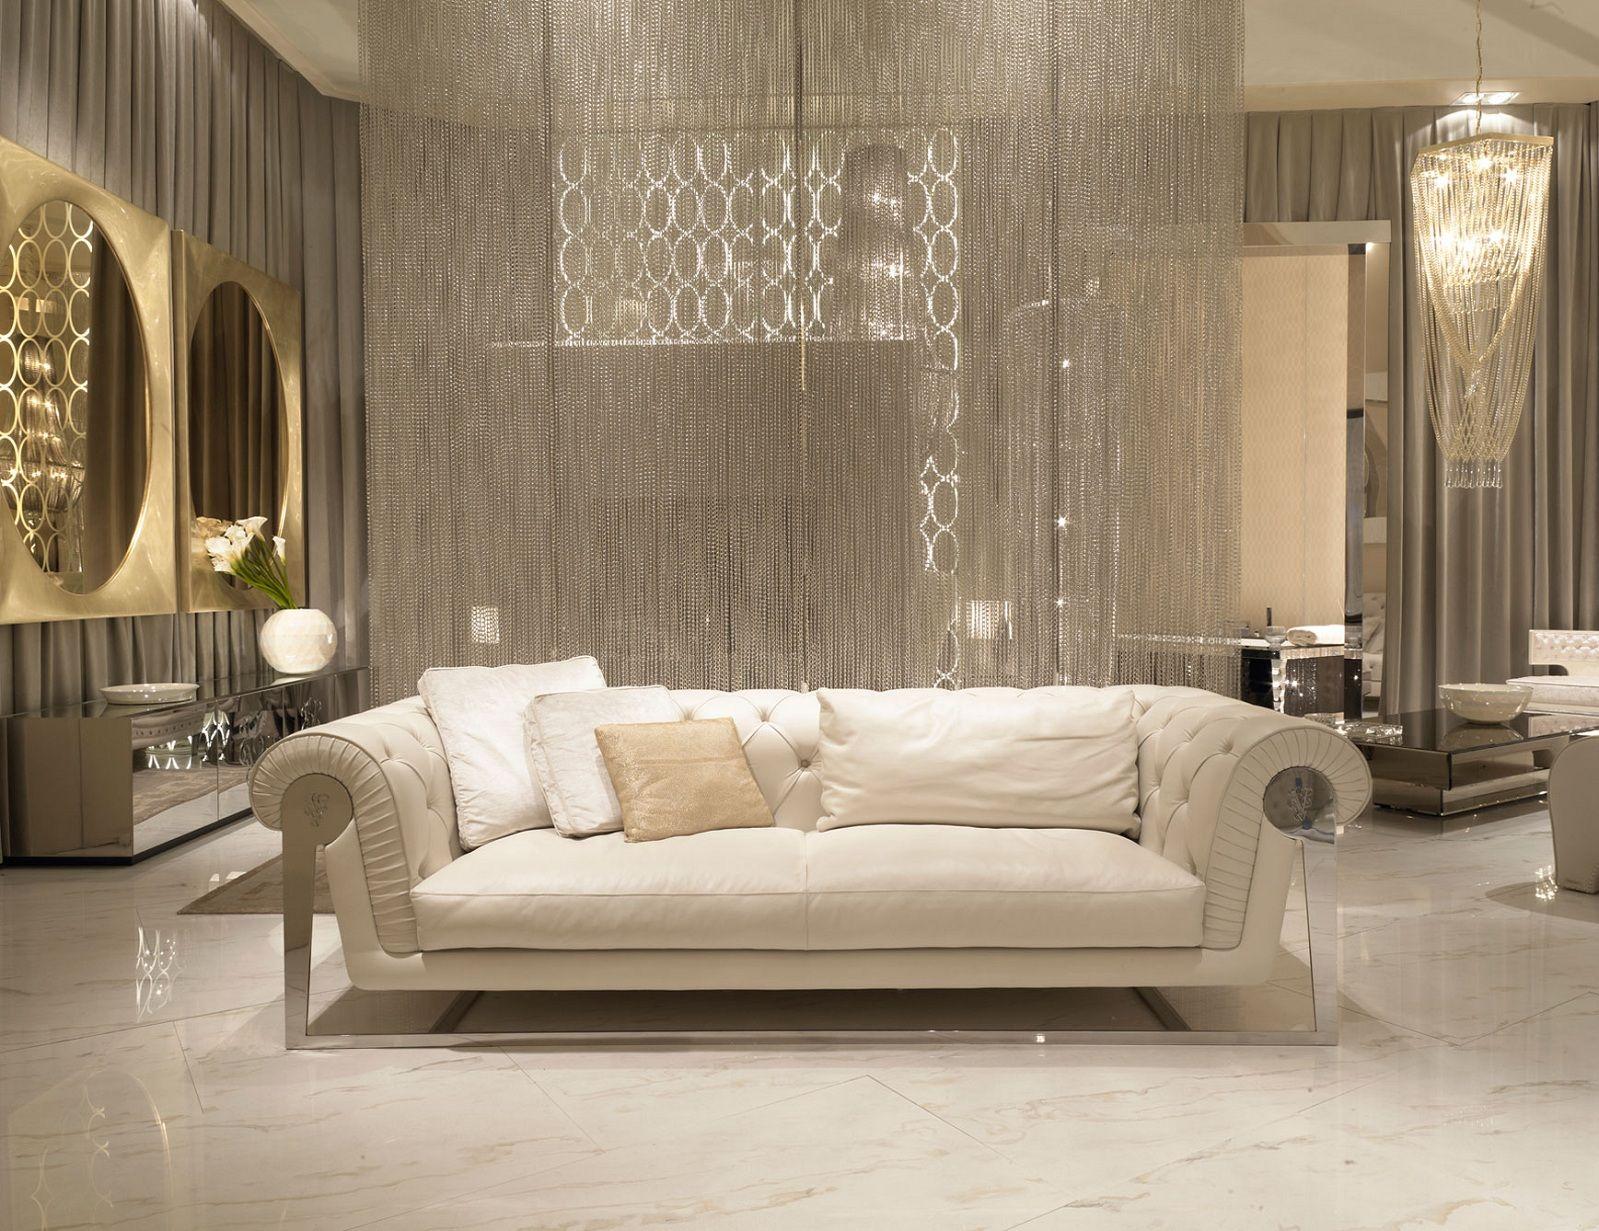 Luxe Italian Designer White Leather Sofa Luxury Furniture Luxury Interior Living Room Design Modern